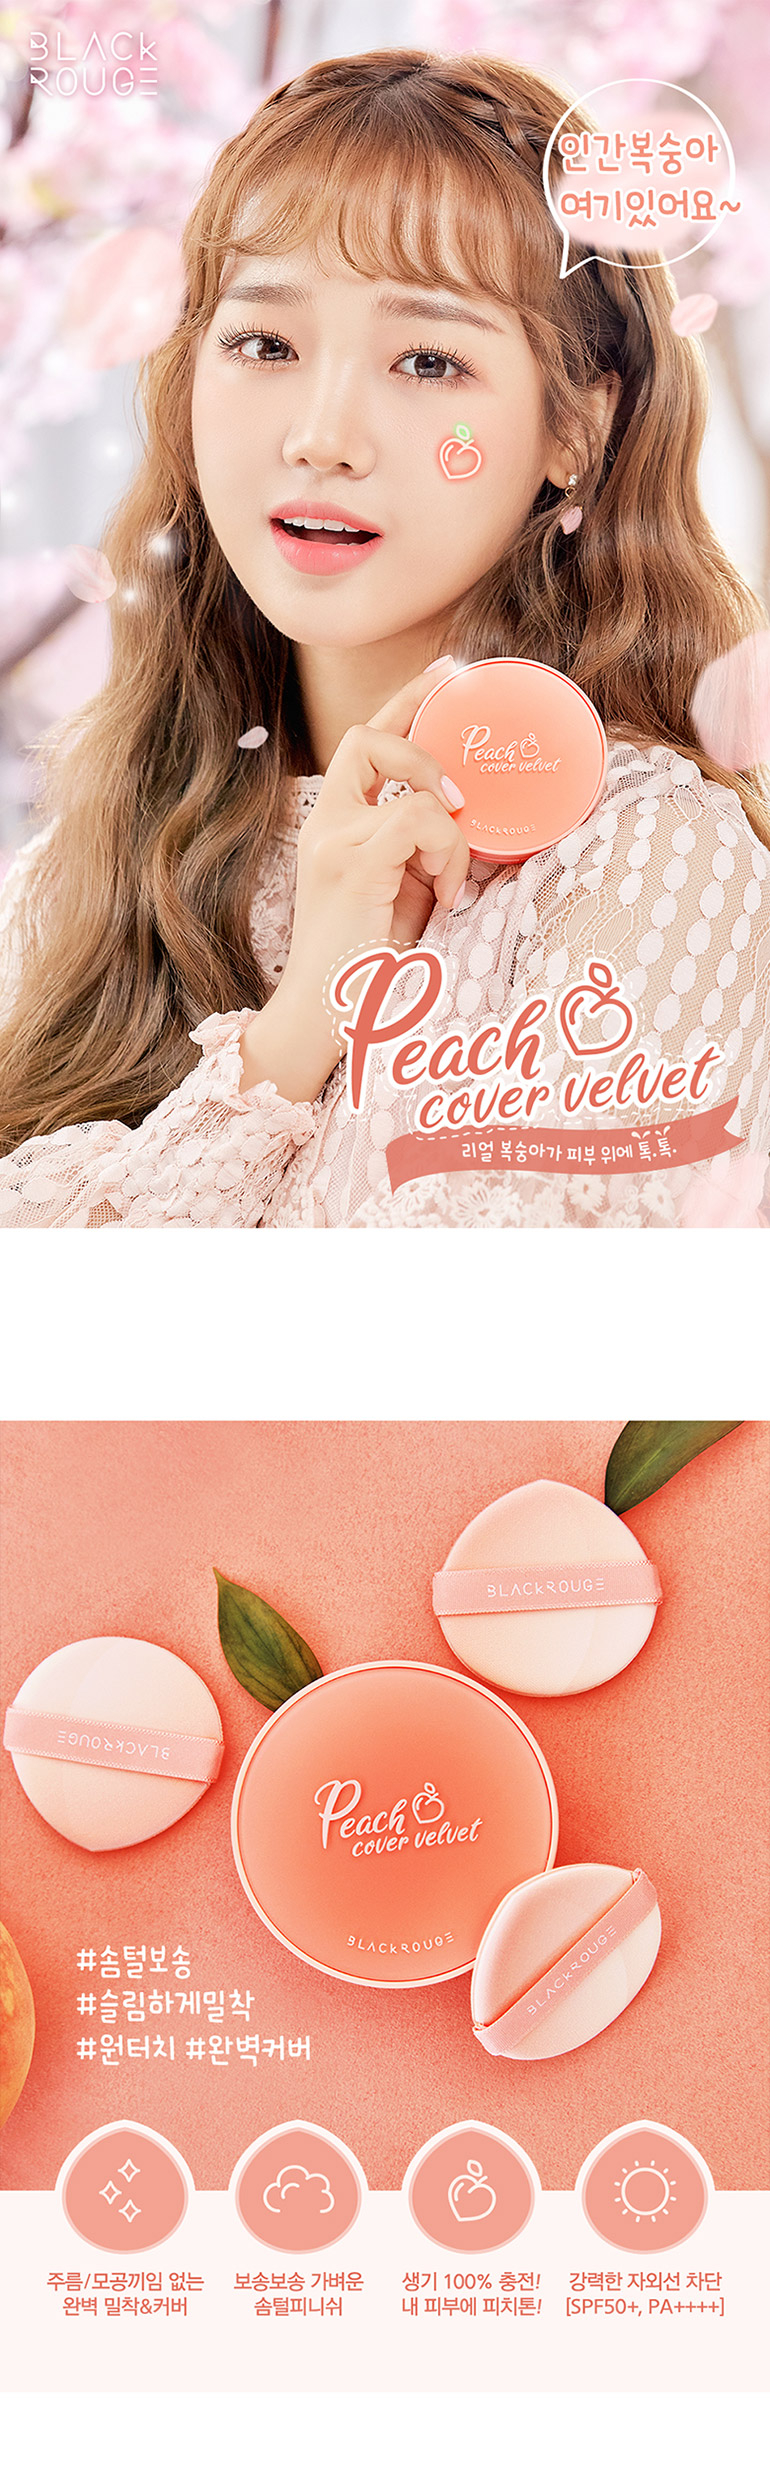 Phấn Nước Black Rouge Peach Cover Velvet Cushion 14g